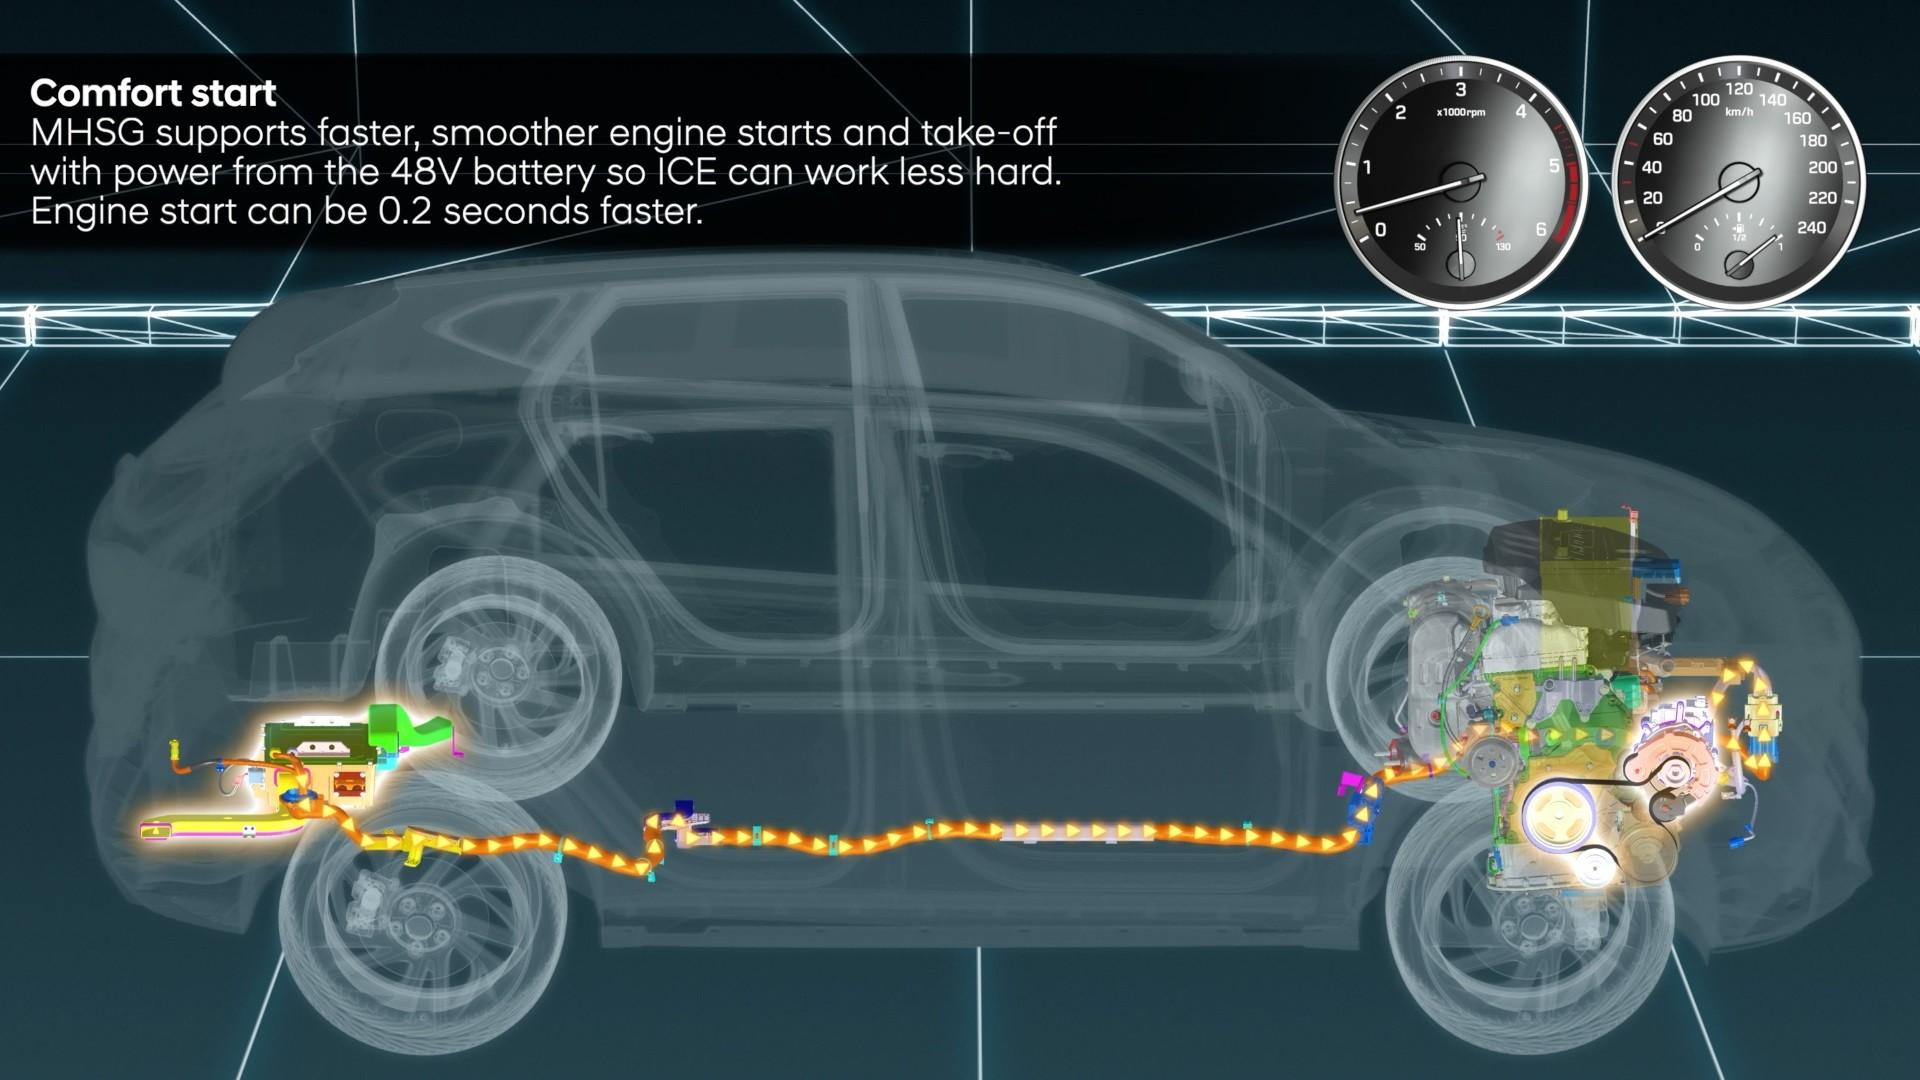 Here's How the Hyundai Mild-Hybrid 1 6 CRDi Turbo Diesel